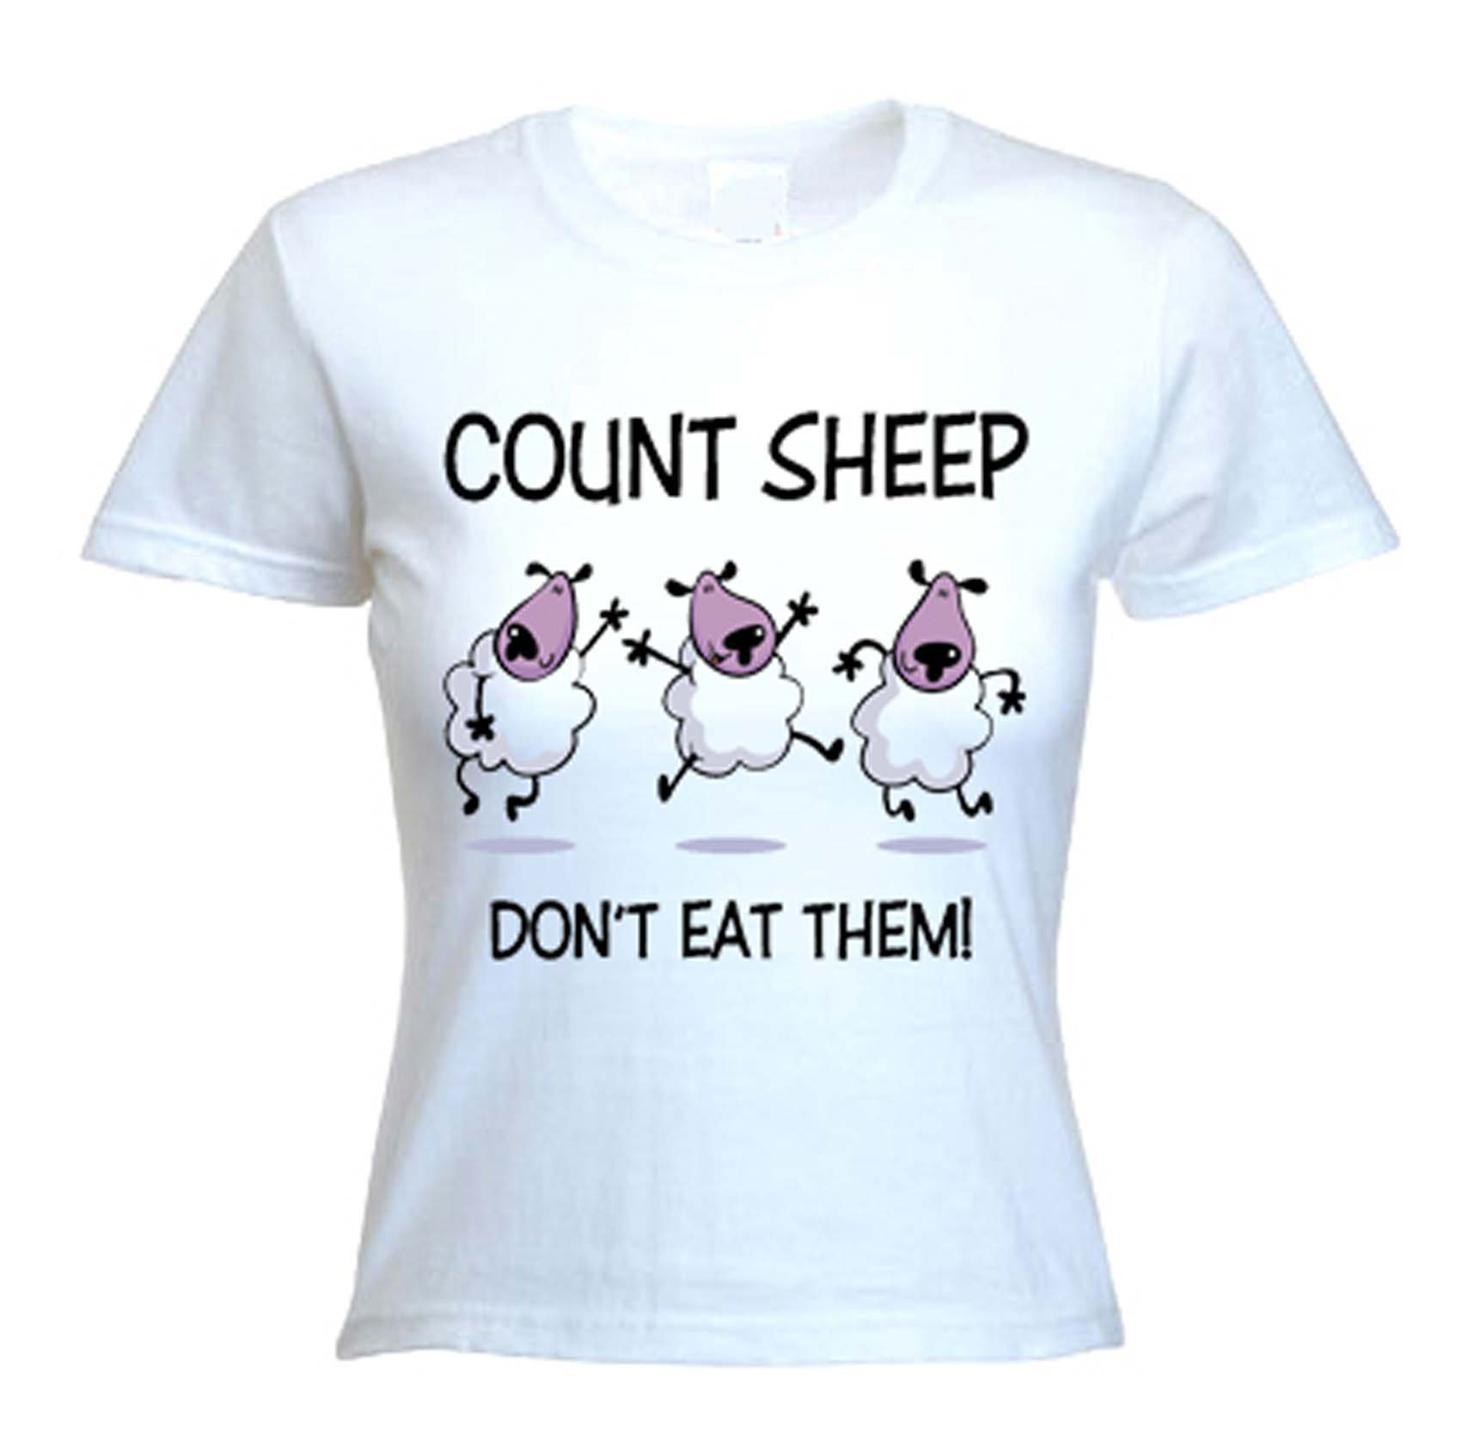 7cb64748b COUNT SHEEP, DON'T EAT THEM T-SHIRT - Vegetarian Vegan Veggie - Sizes S-XL